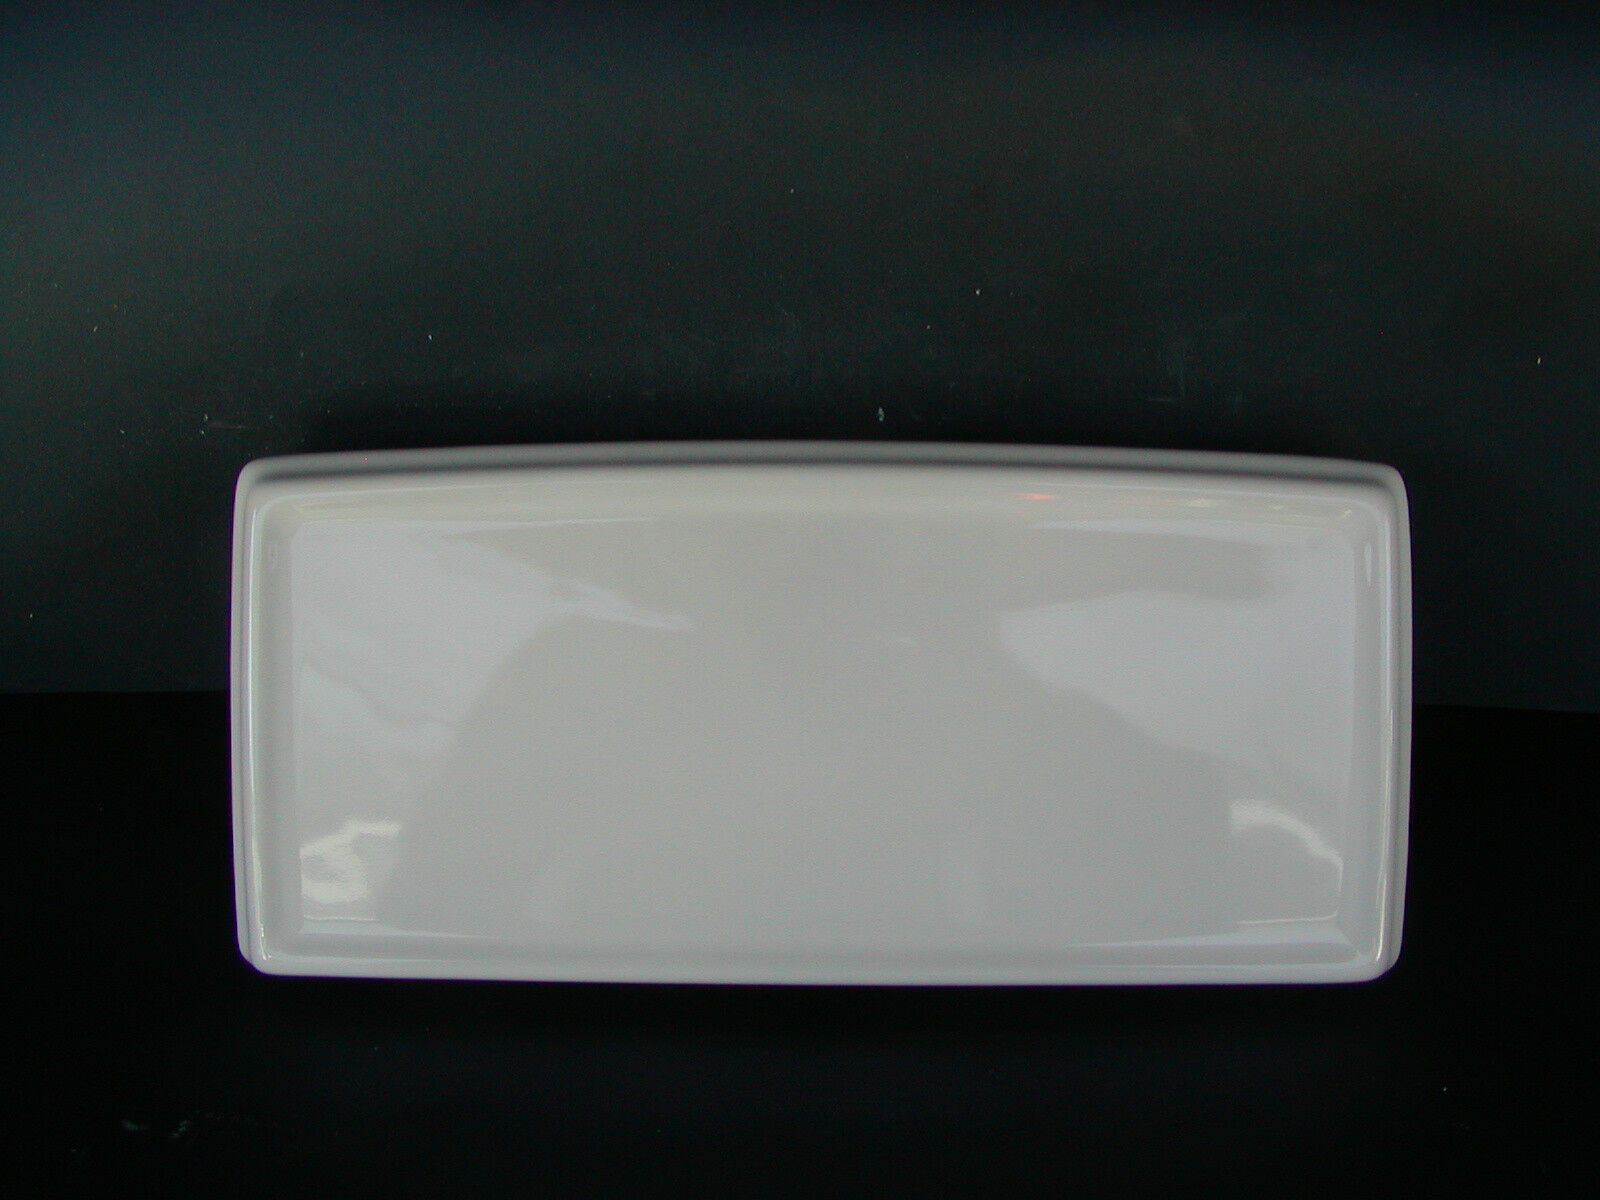 American Standard 735150 Town Square Toilet Tank Lid White ...